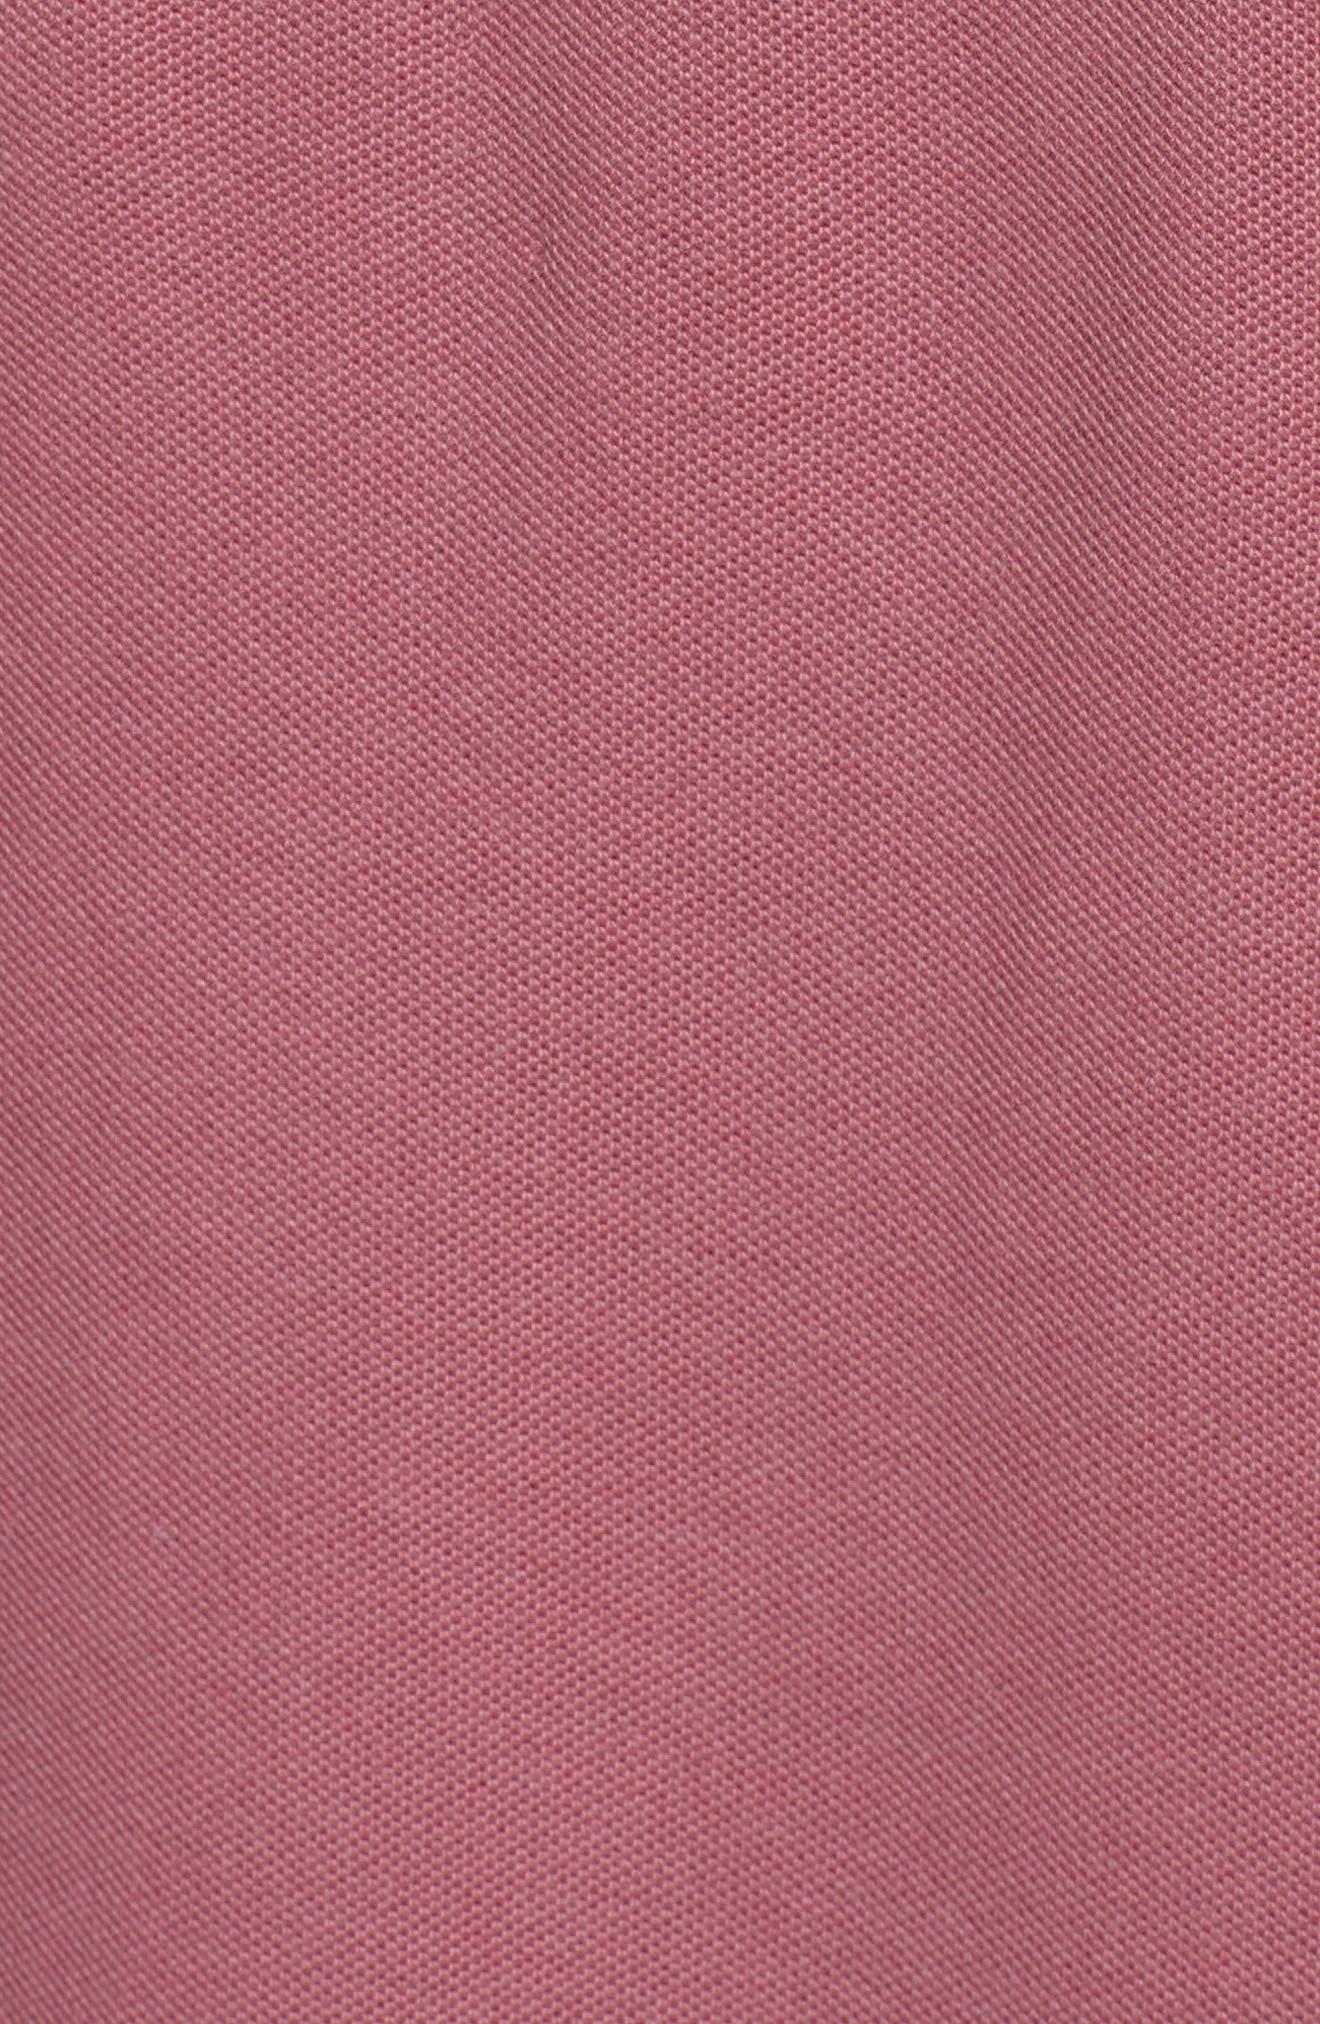 Piqué Hooded Dress,                             Alternate thumbnail 5, color,                             610